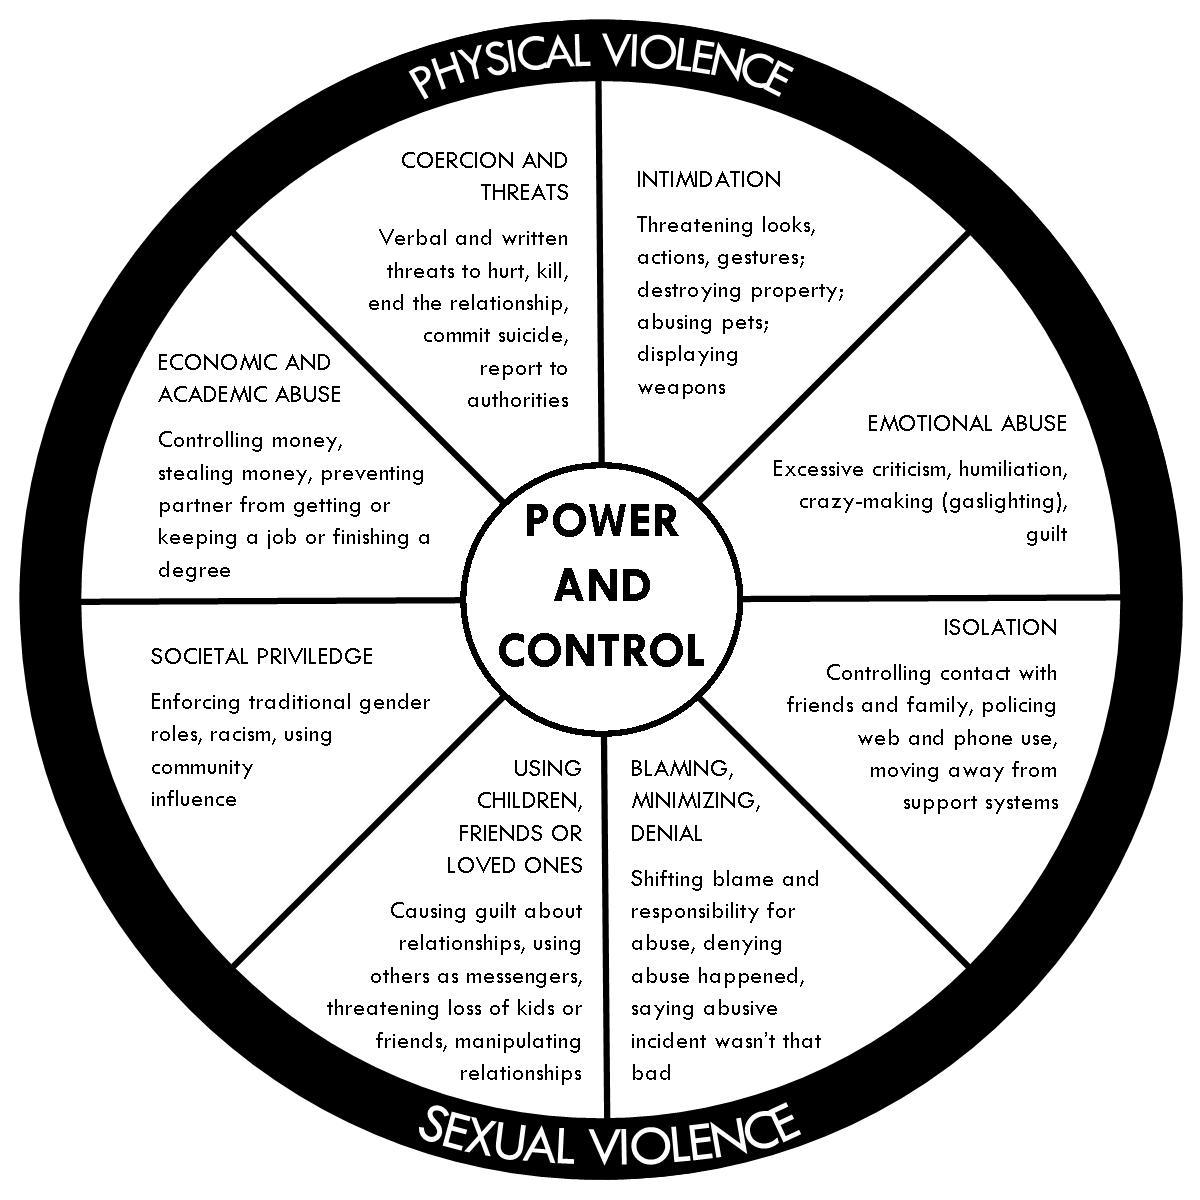 Domestic Intimate Partner Violence Advocacy Center